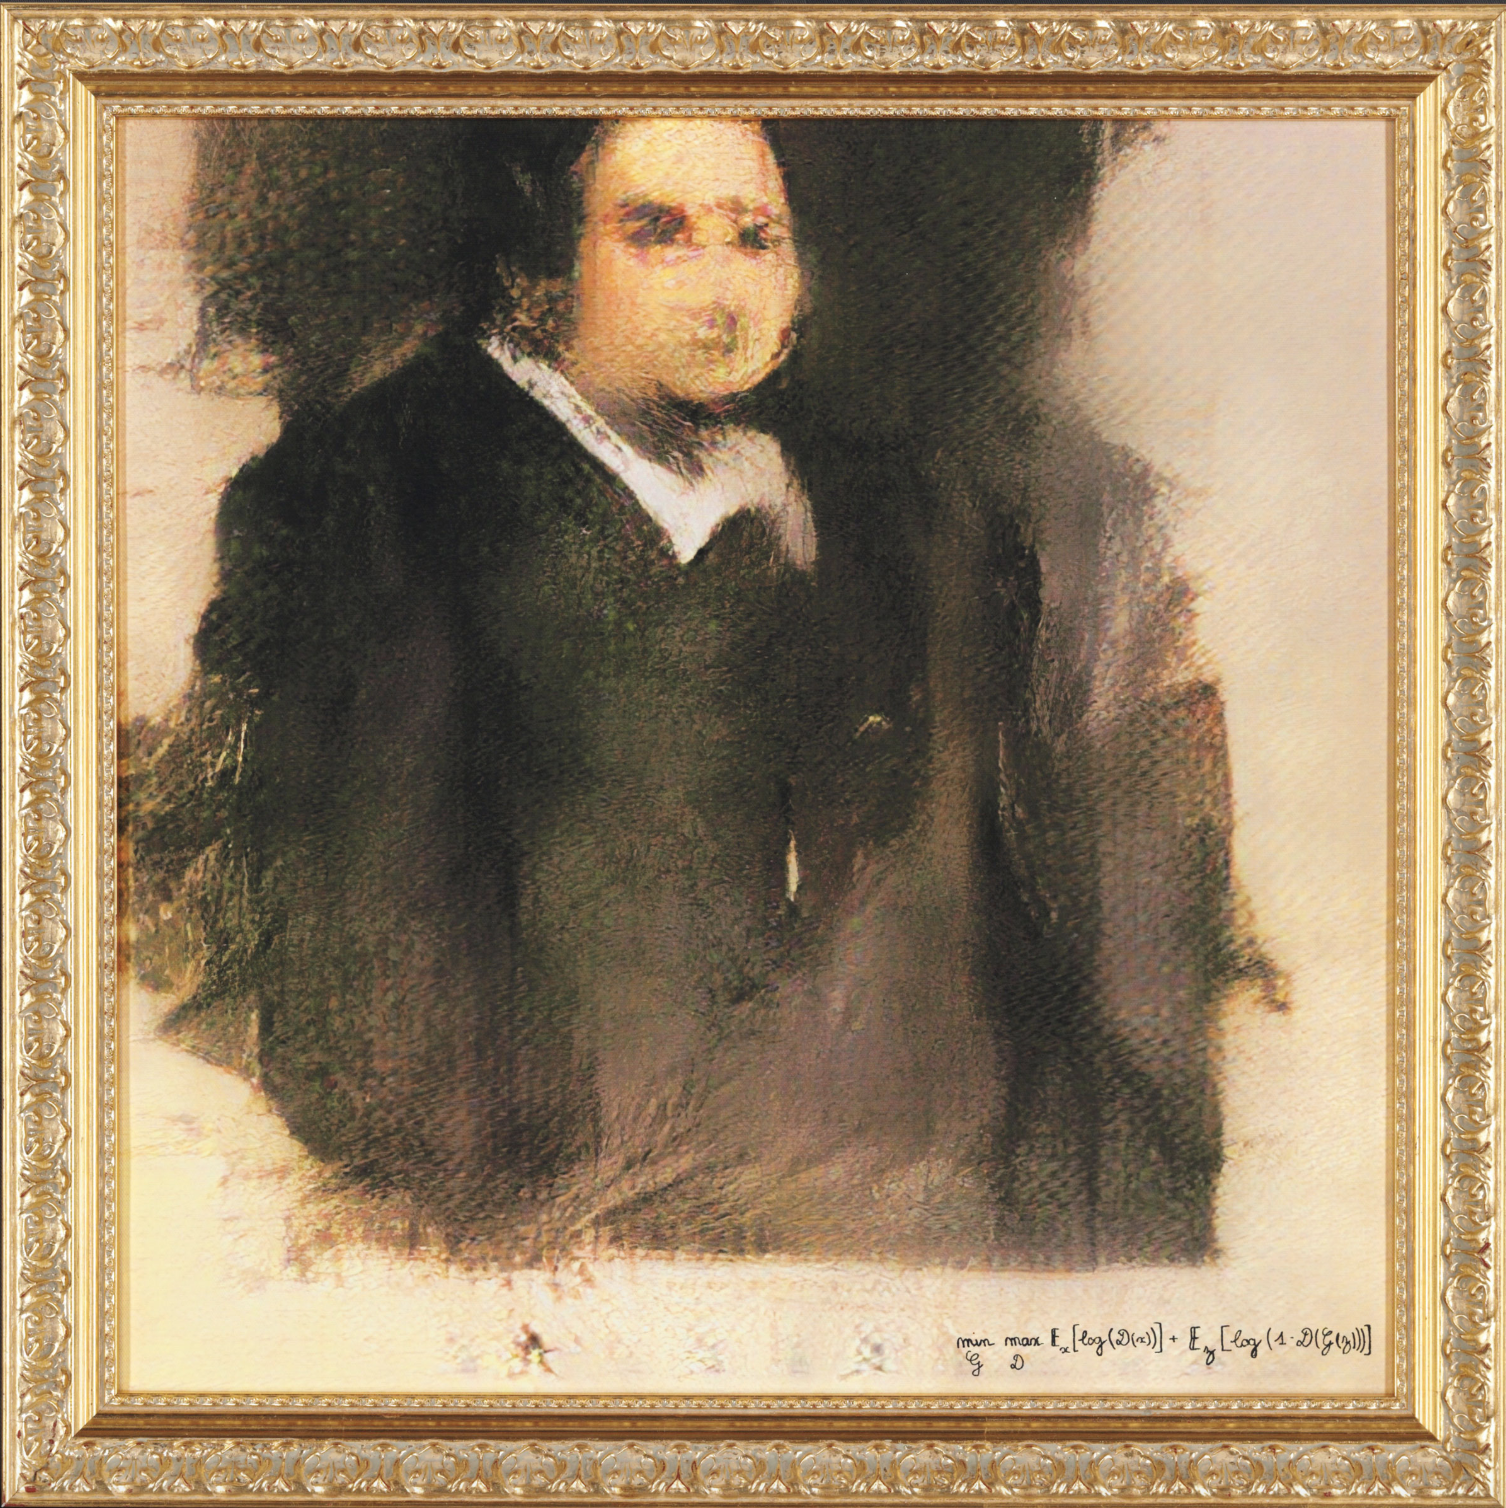 GAN - Portrait of Edmond Belamy